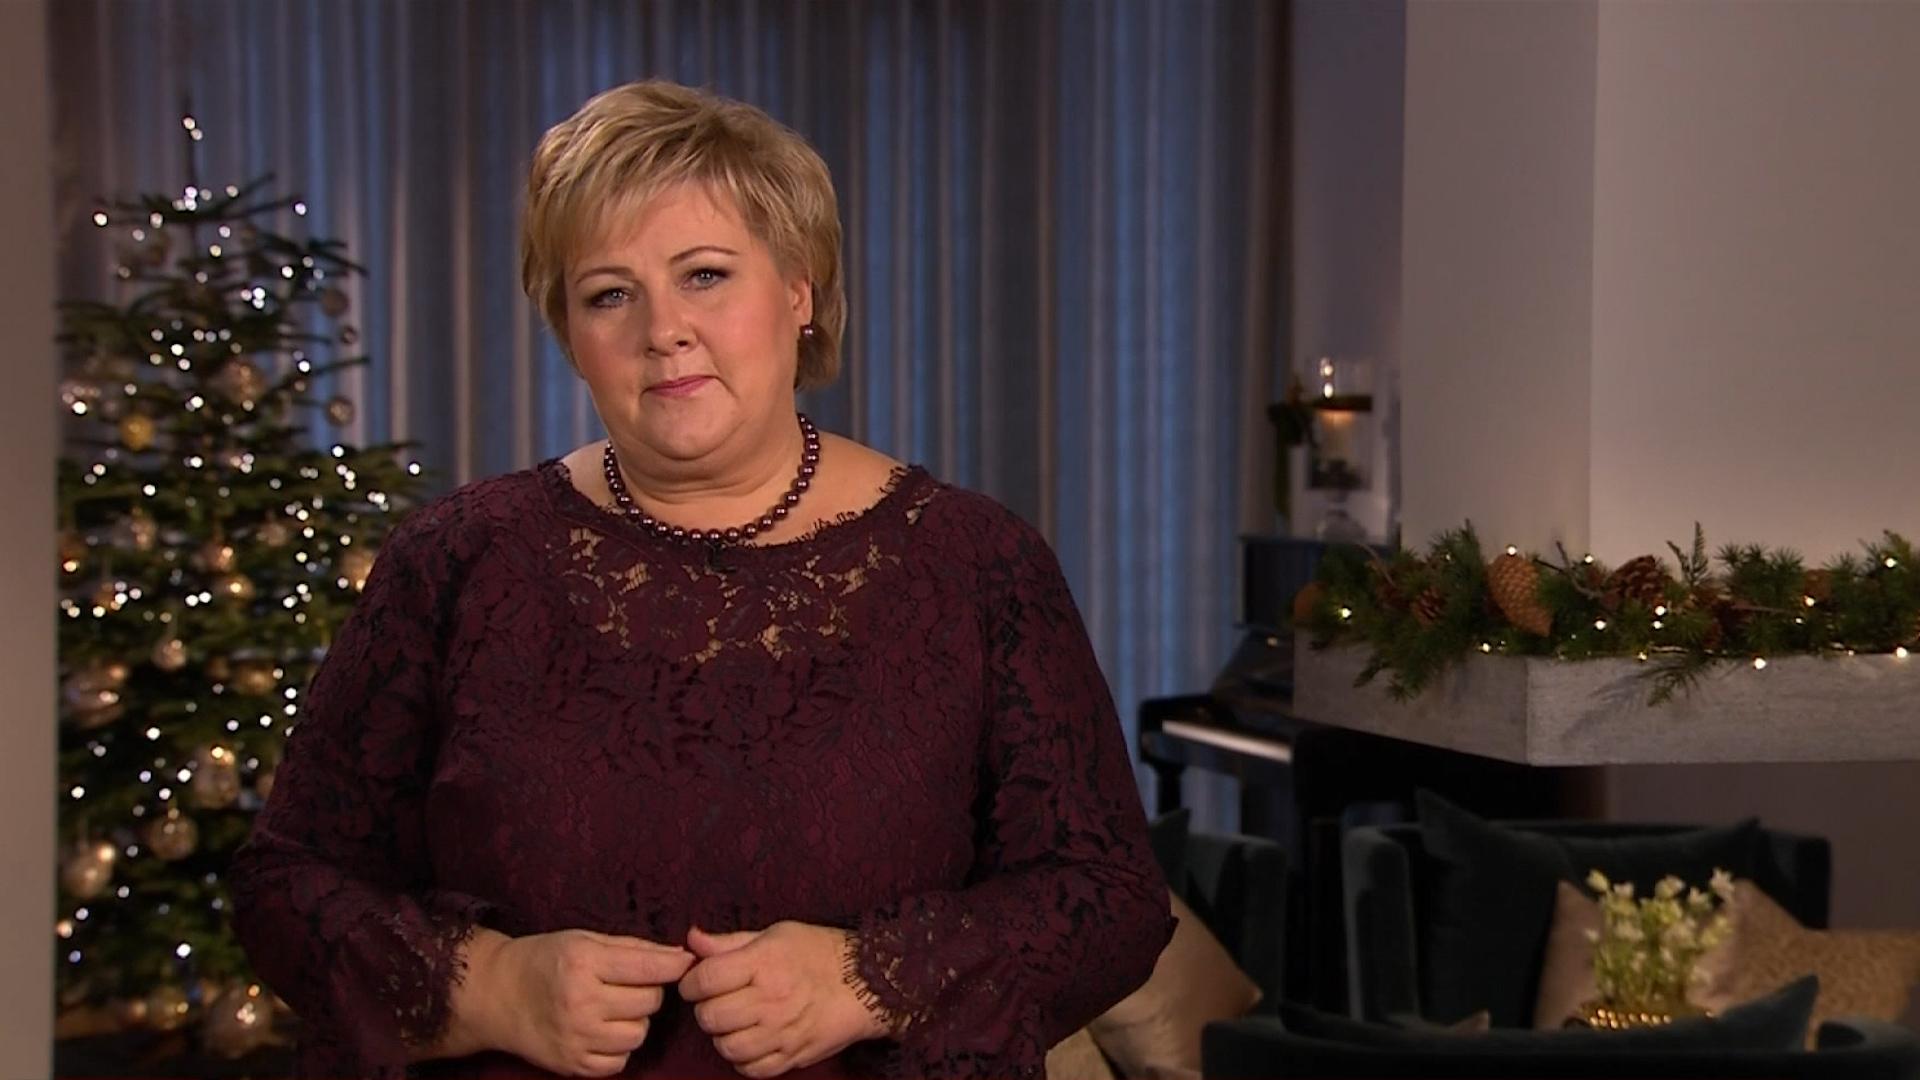 Siste video: Erna Solbergs nyttårstale